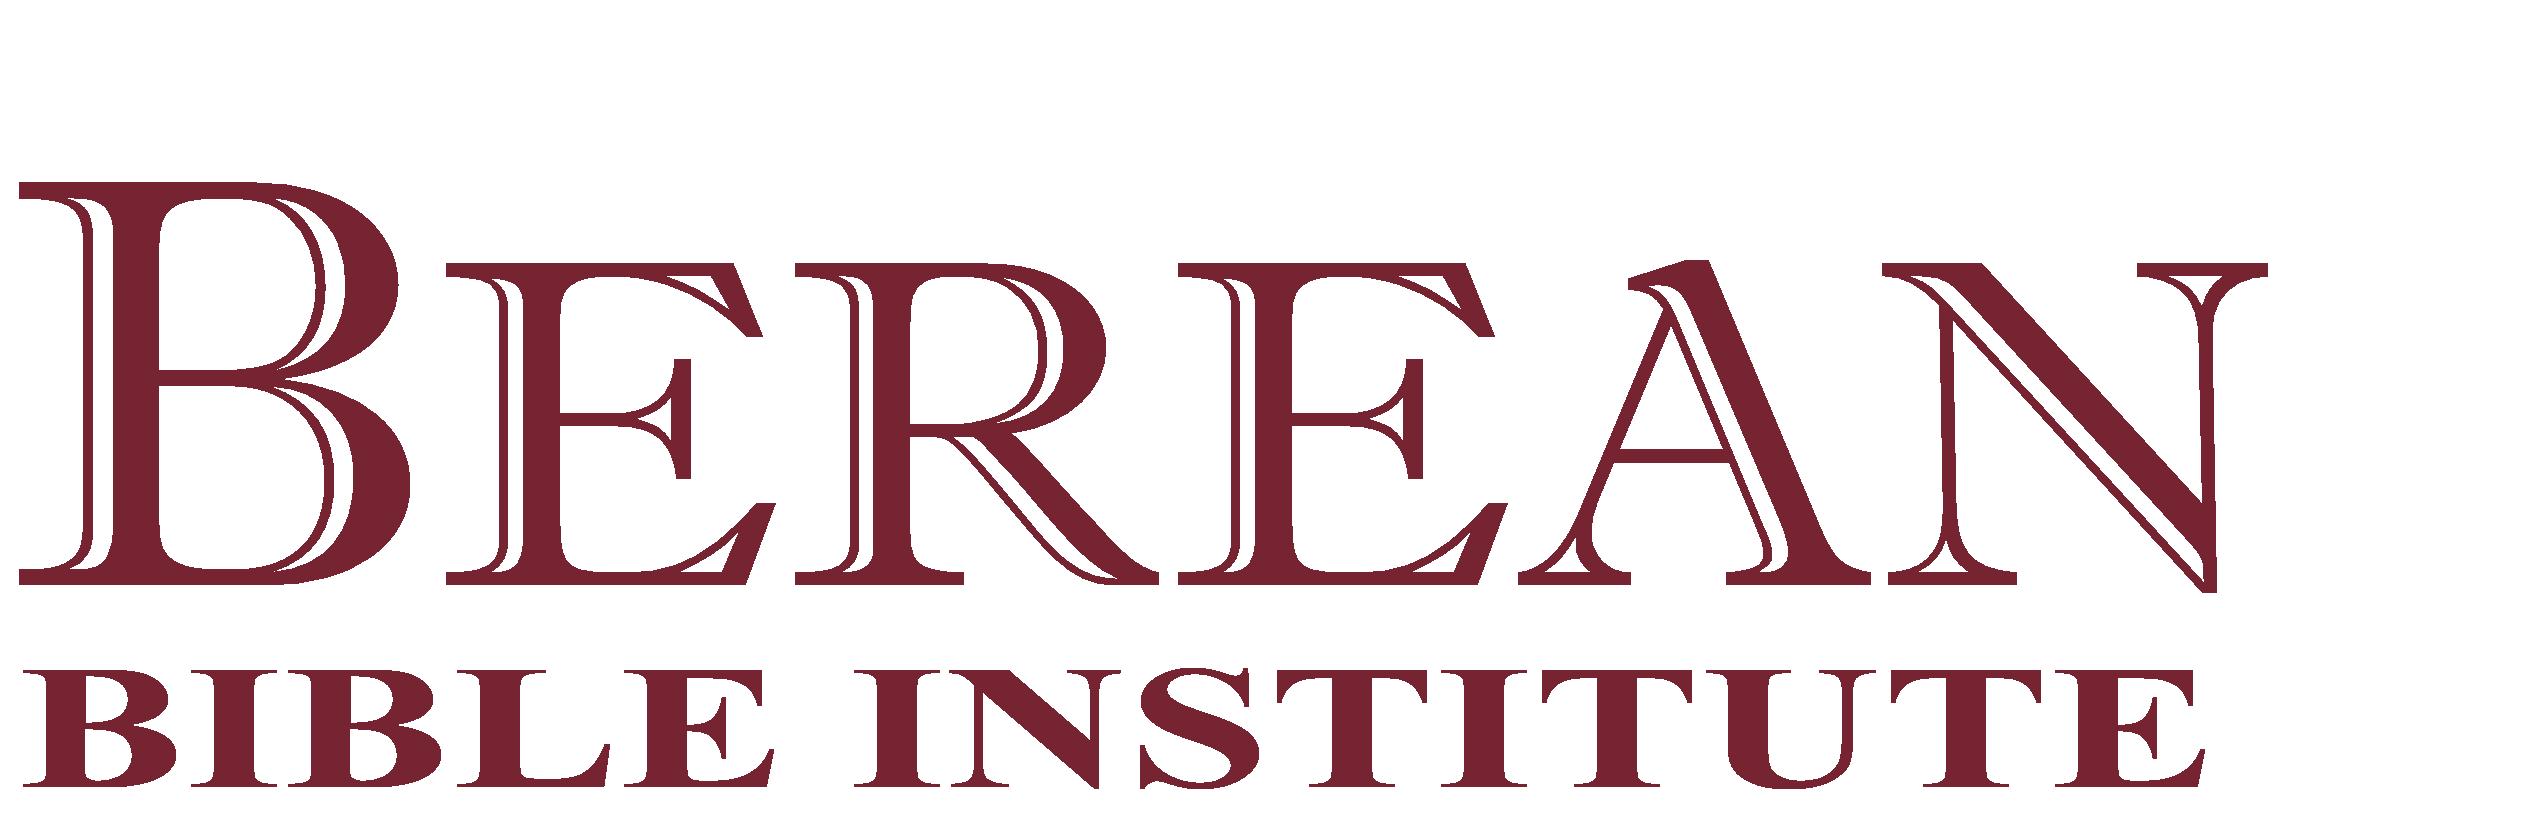 Virtual, Instructor-Led Course Enrollment